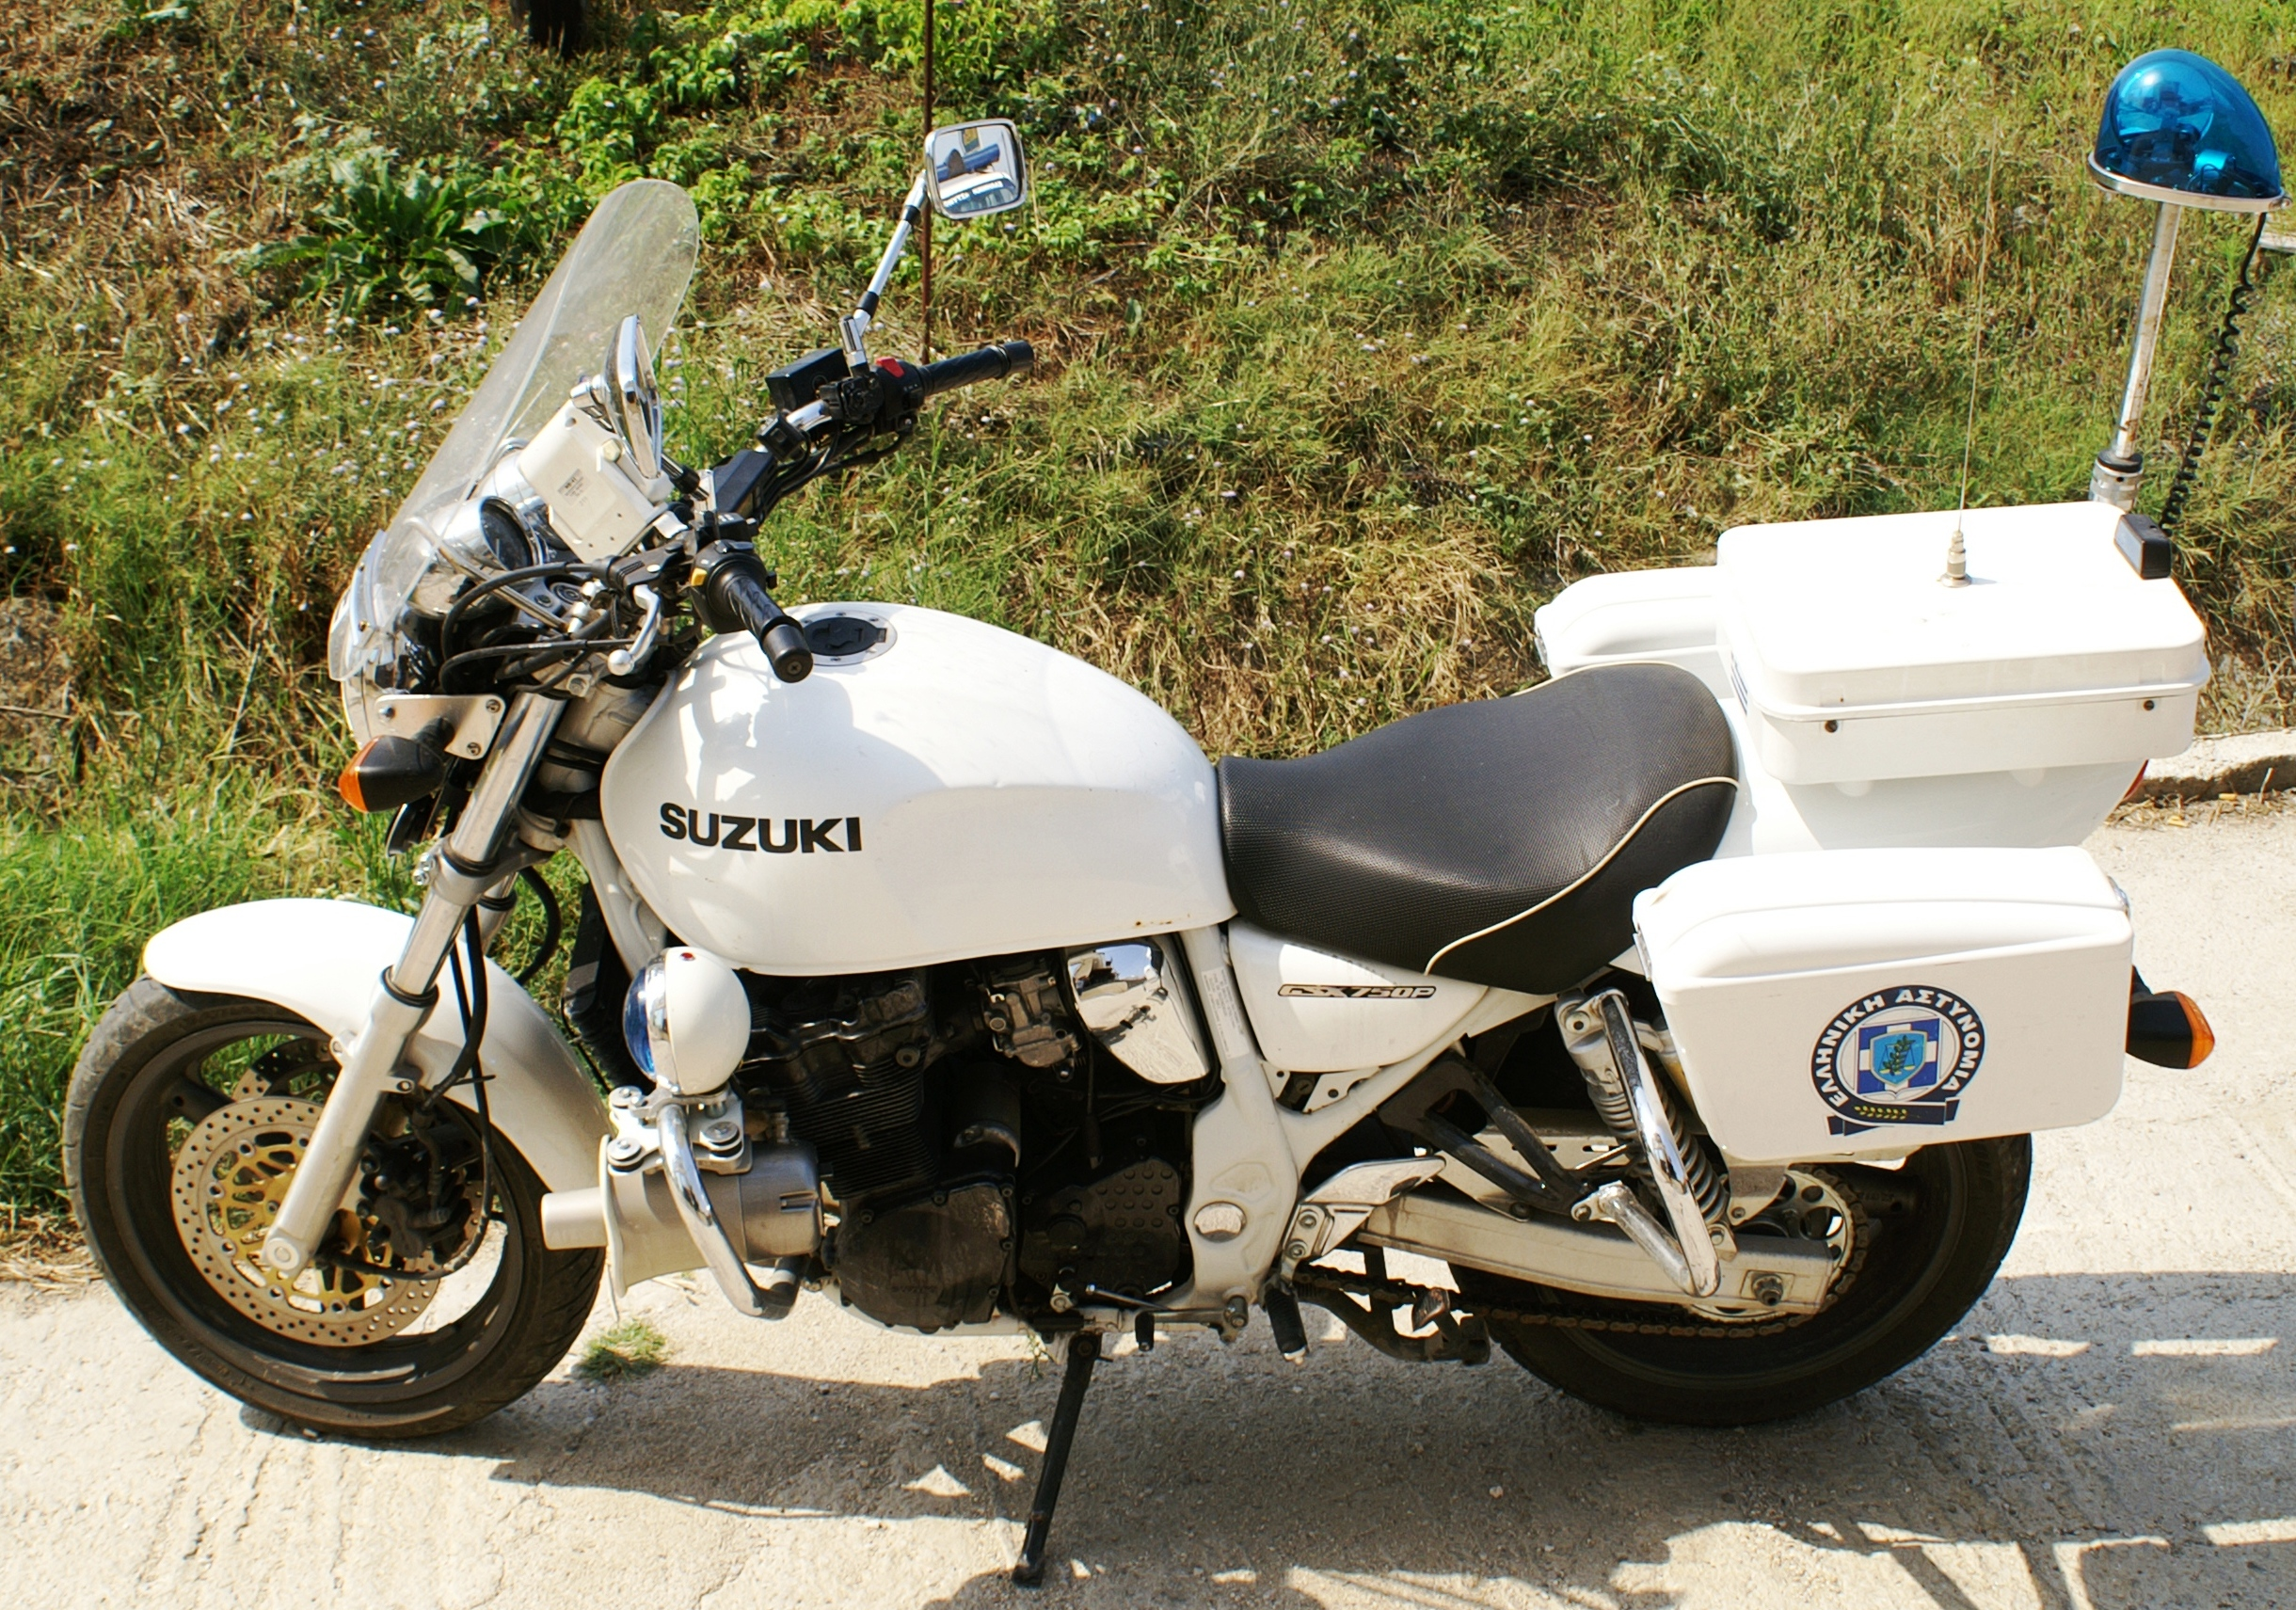 Suzuki Motorcycle Charger